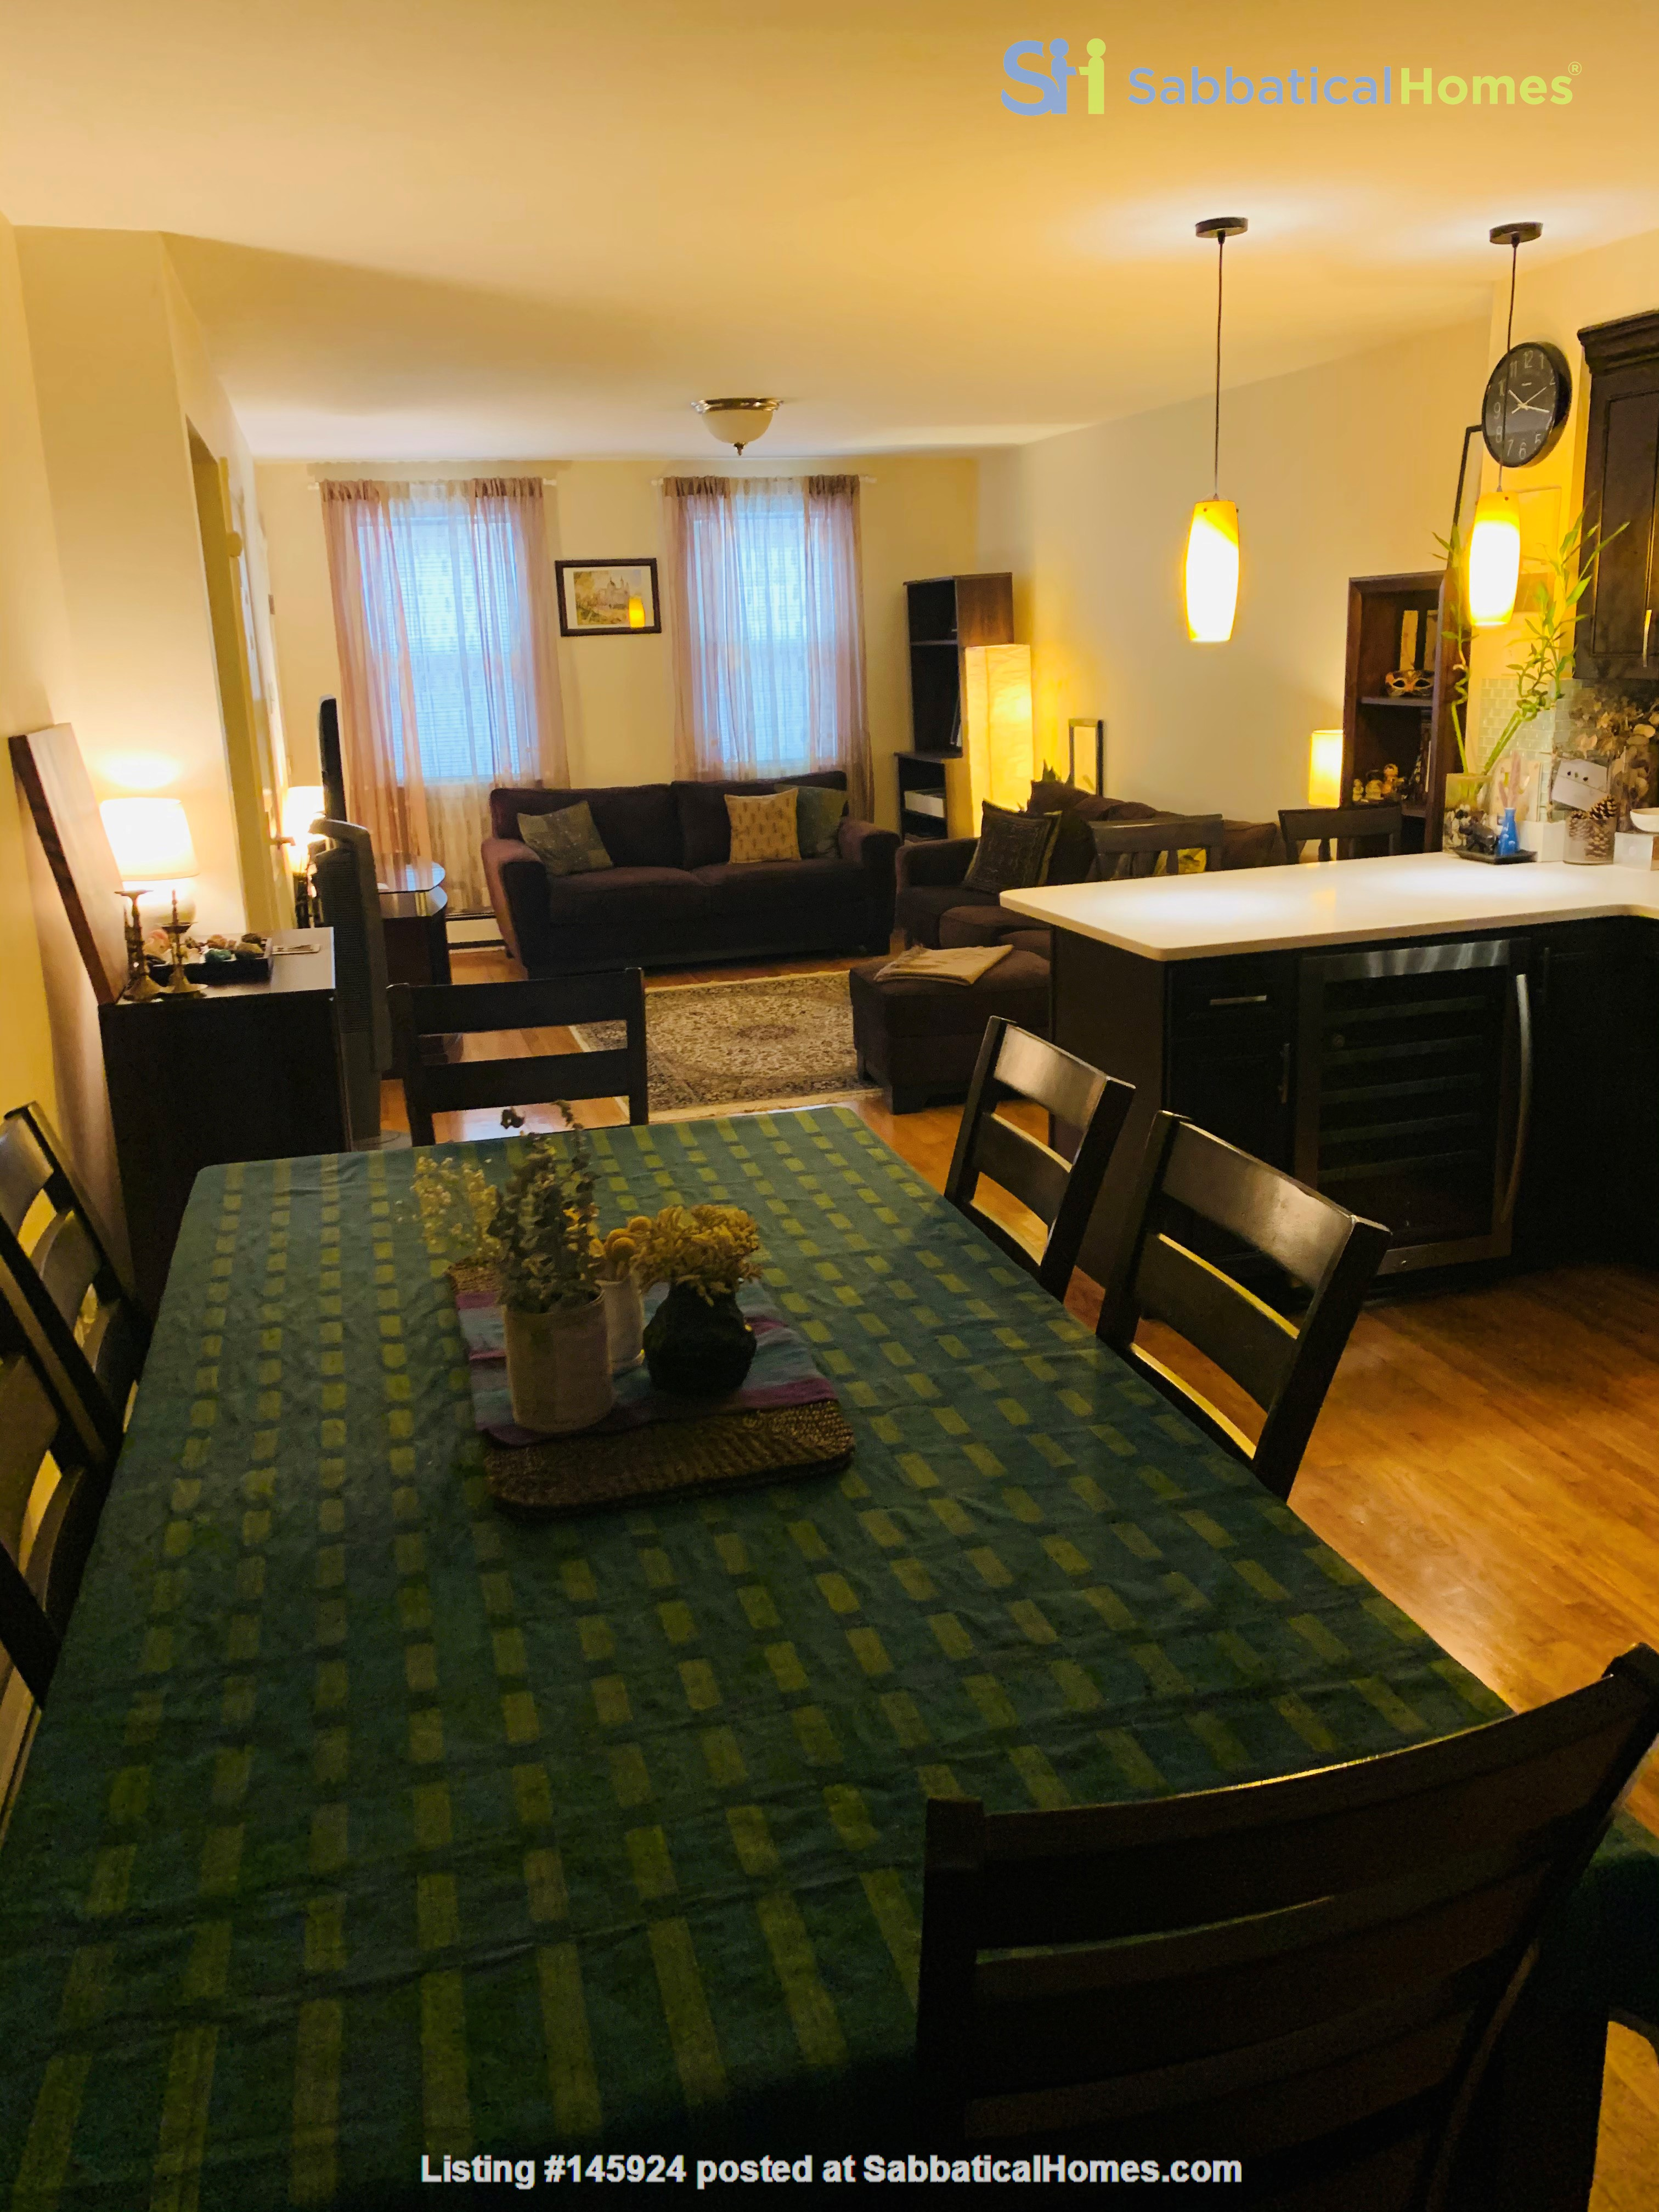 Modern, sunny, 2 bed 1 bath 1st floor unit with W+D, den & backyard garden Home Rental in Cambridge 2